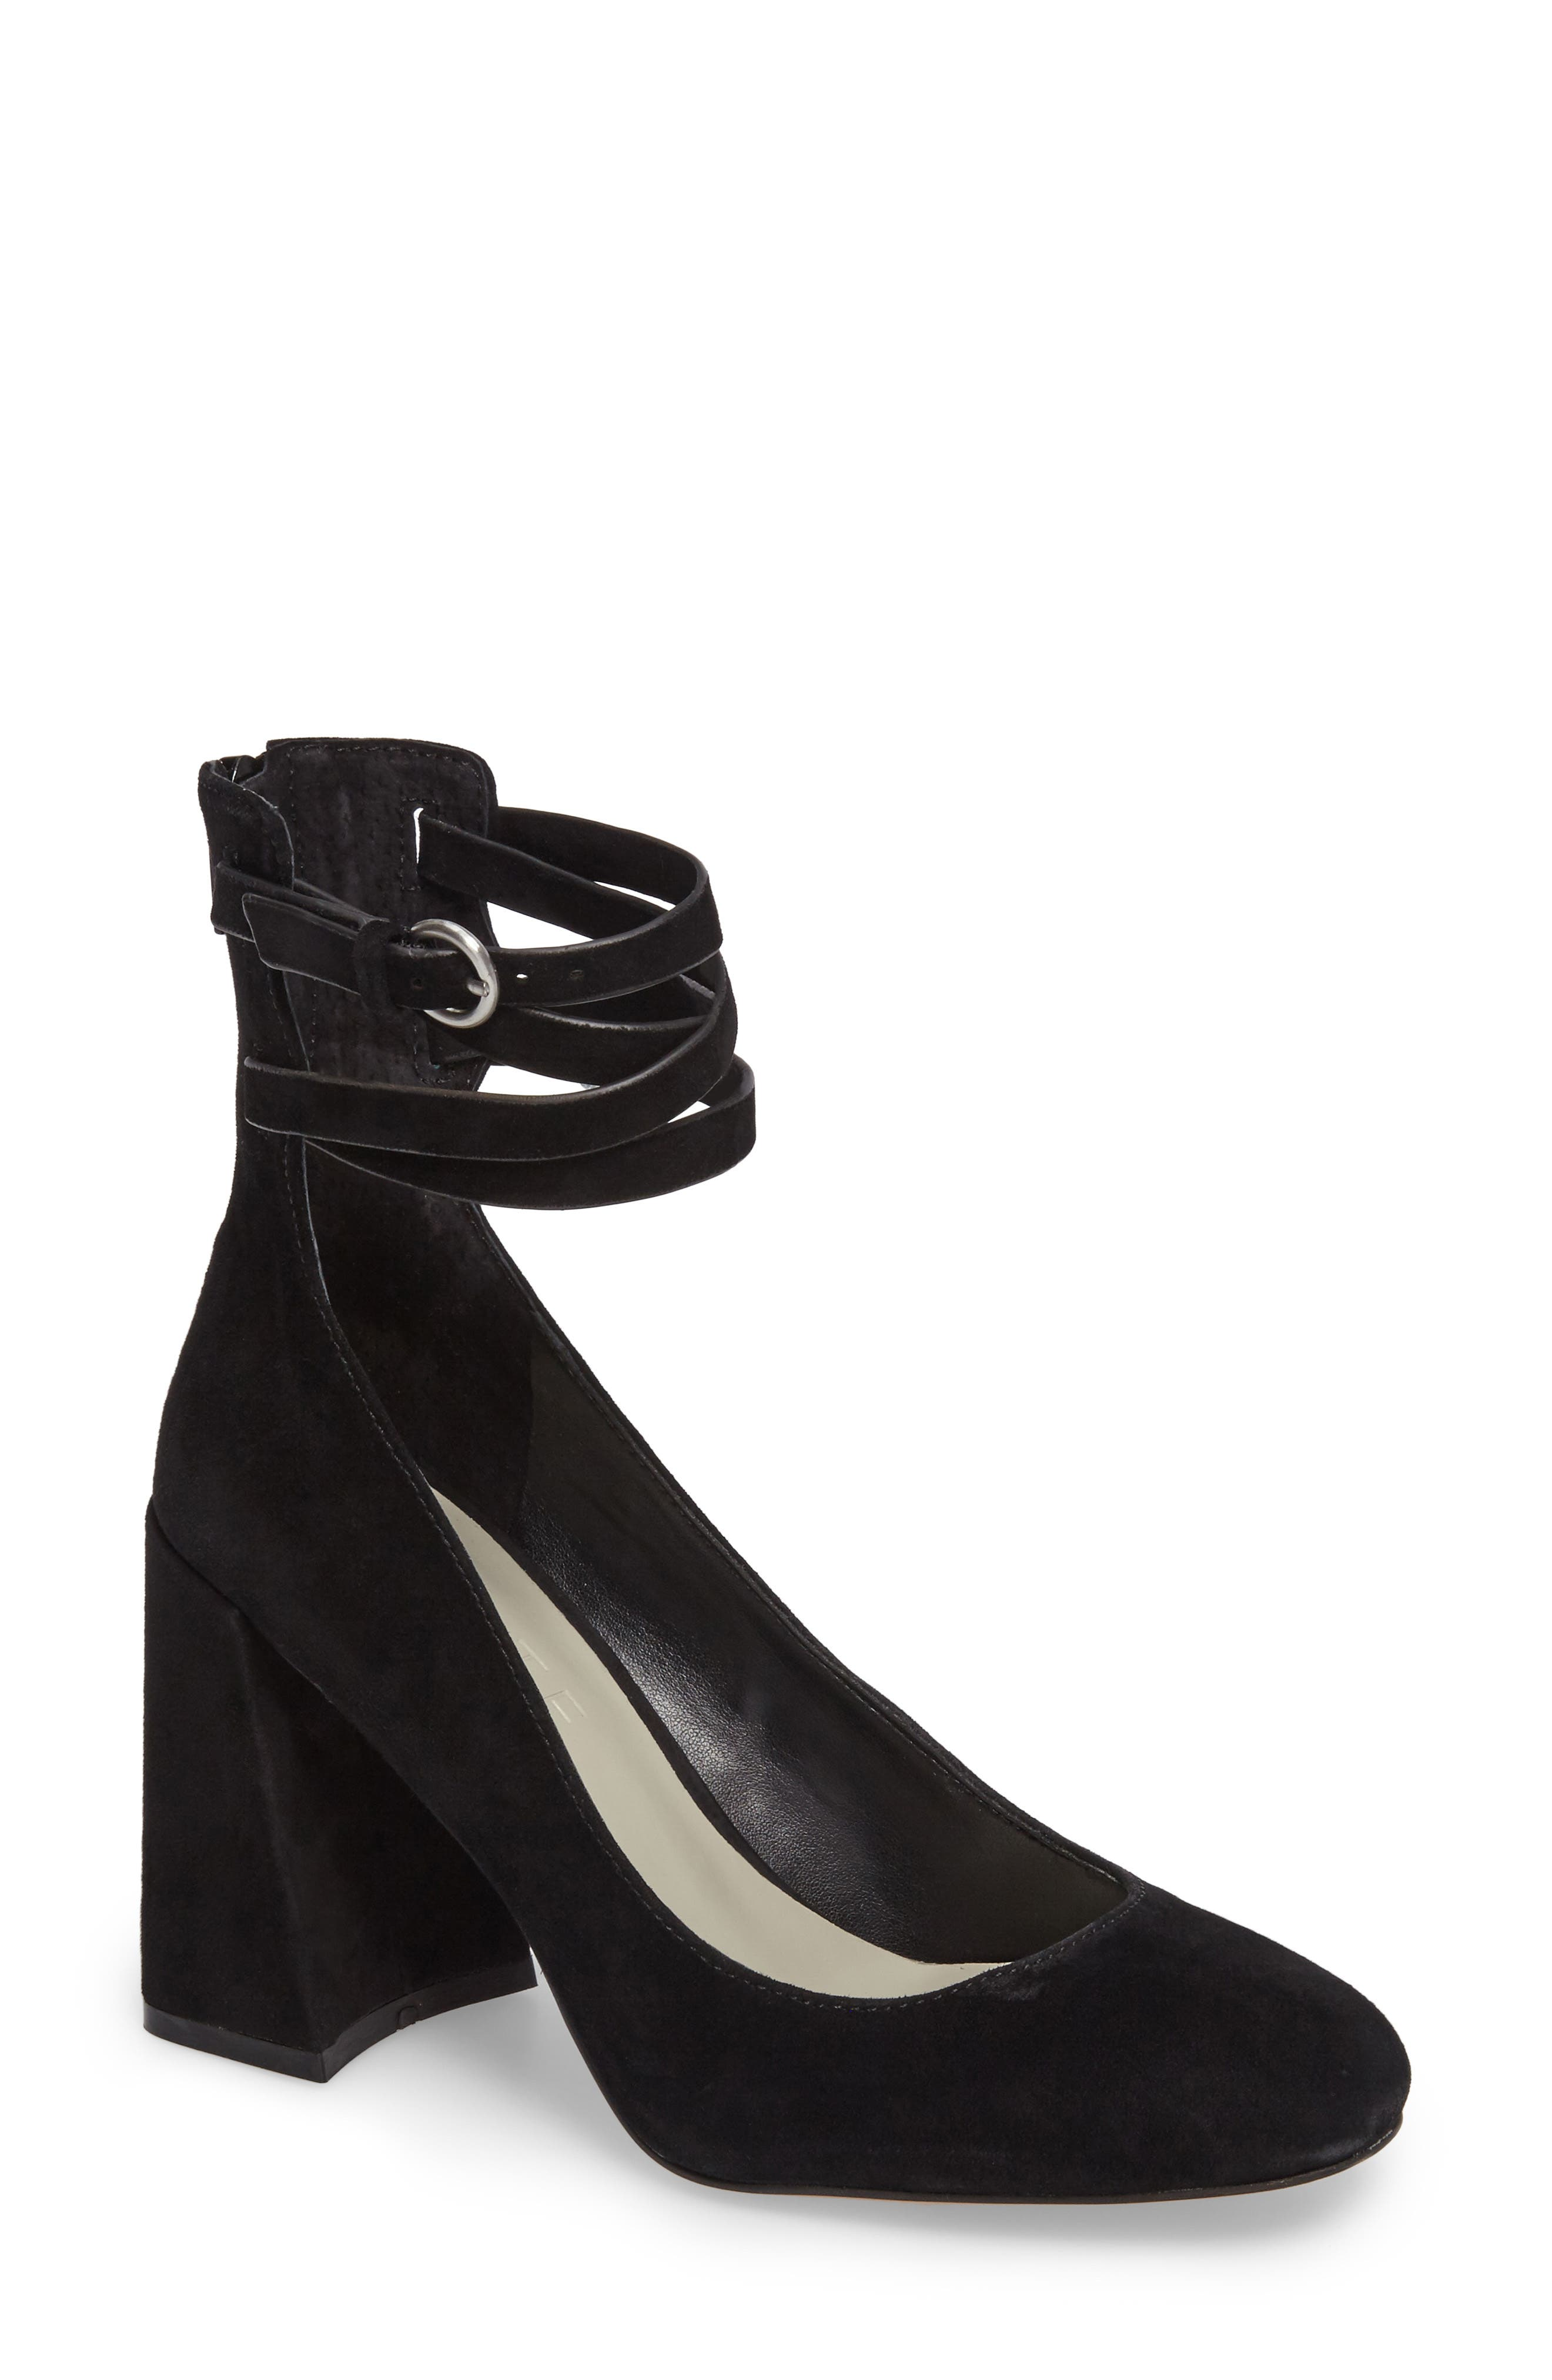 Main Image - 1.STATE Makal Flared Heel Wraparound Pump (Women)